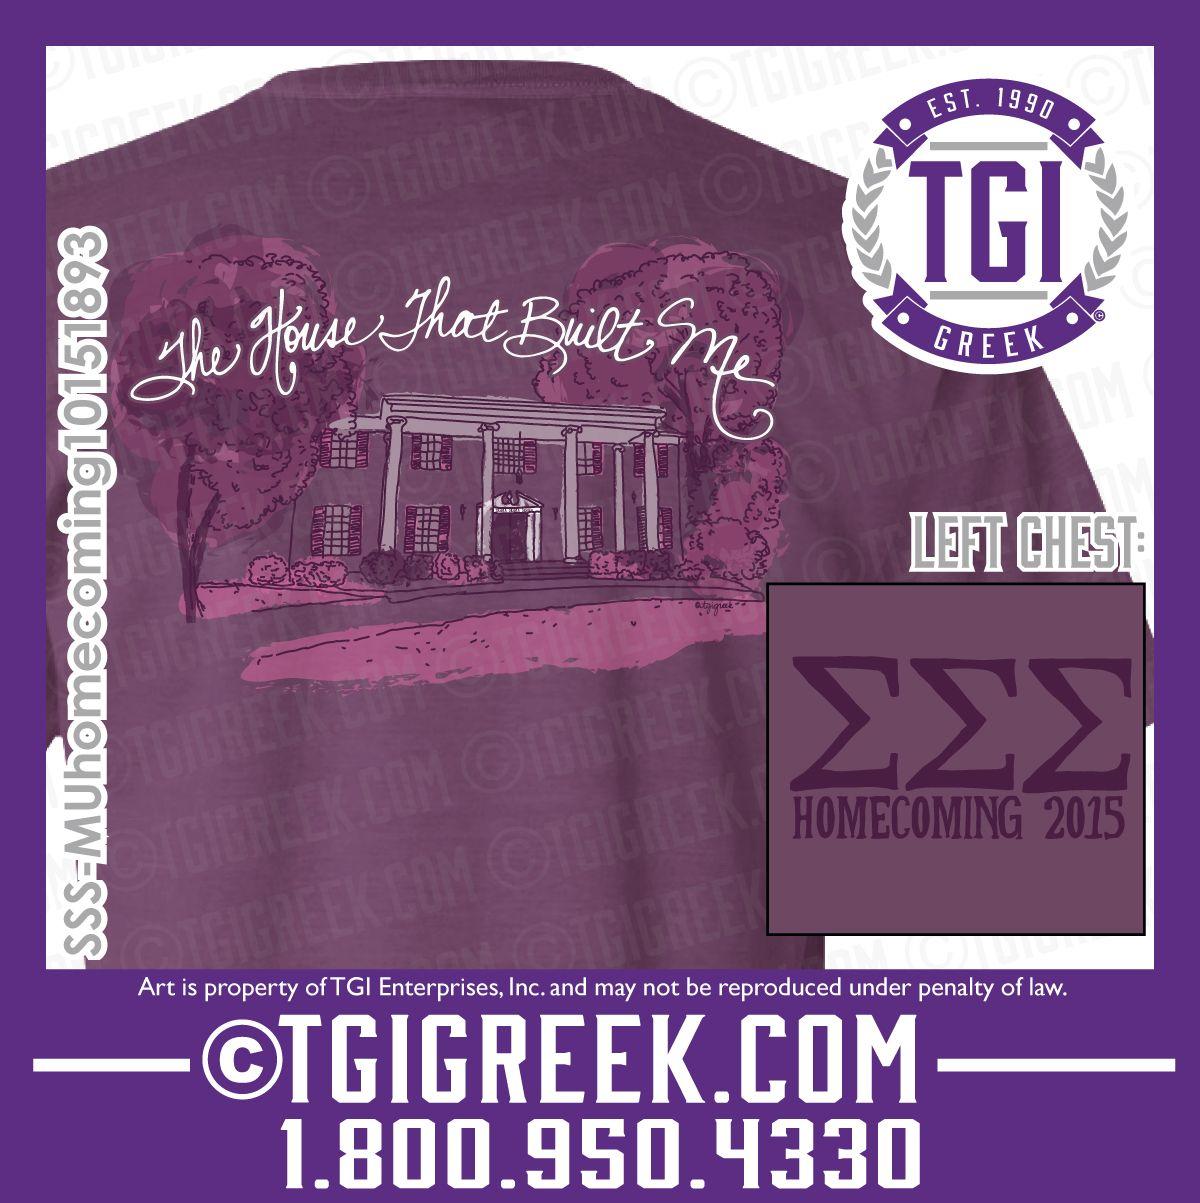 Design t shirt comfort colors - Tgi Greek Sigma Sigma Sigma Hand Drawn Design Greek T Shirts Comfort Colorshand Drawn